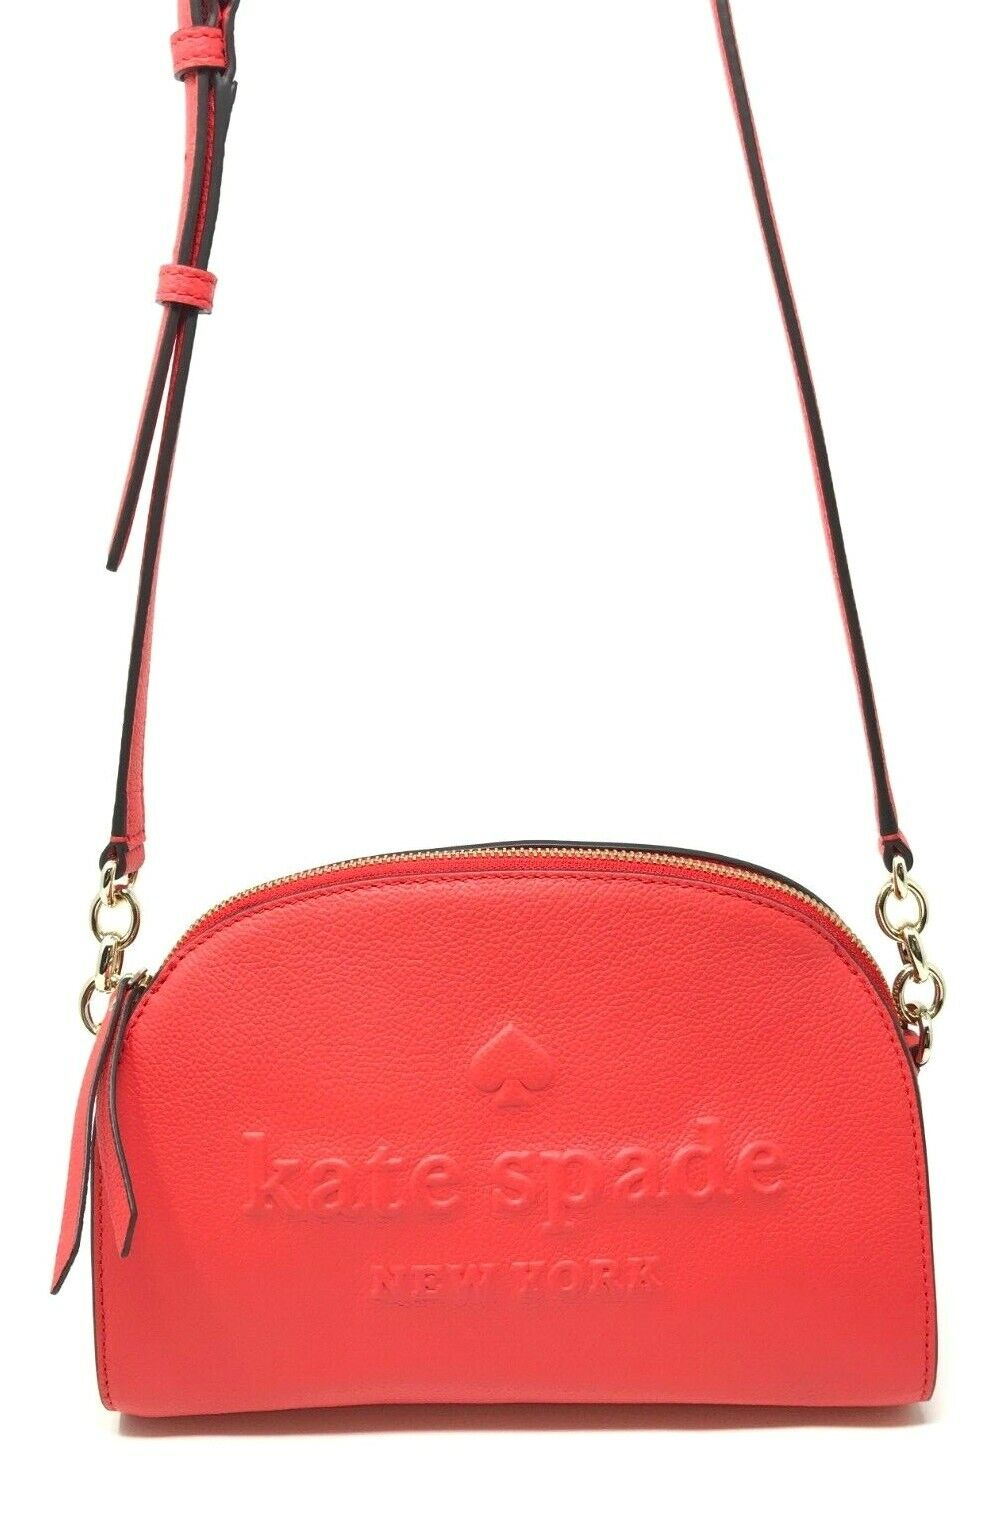 Kate Spade Larchmont Avenue Logo Tori Picnic Red Crossbody Bag